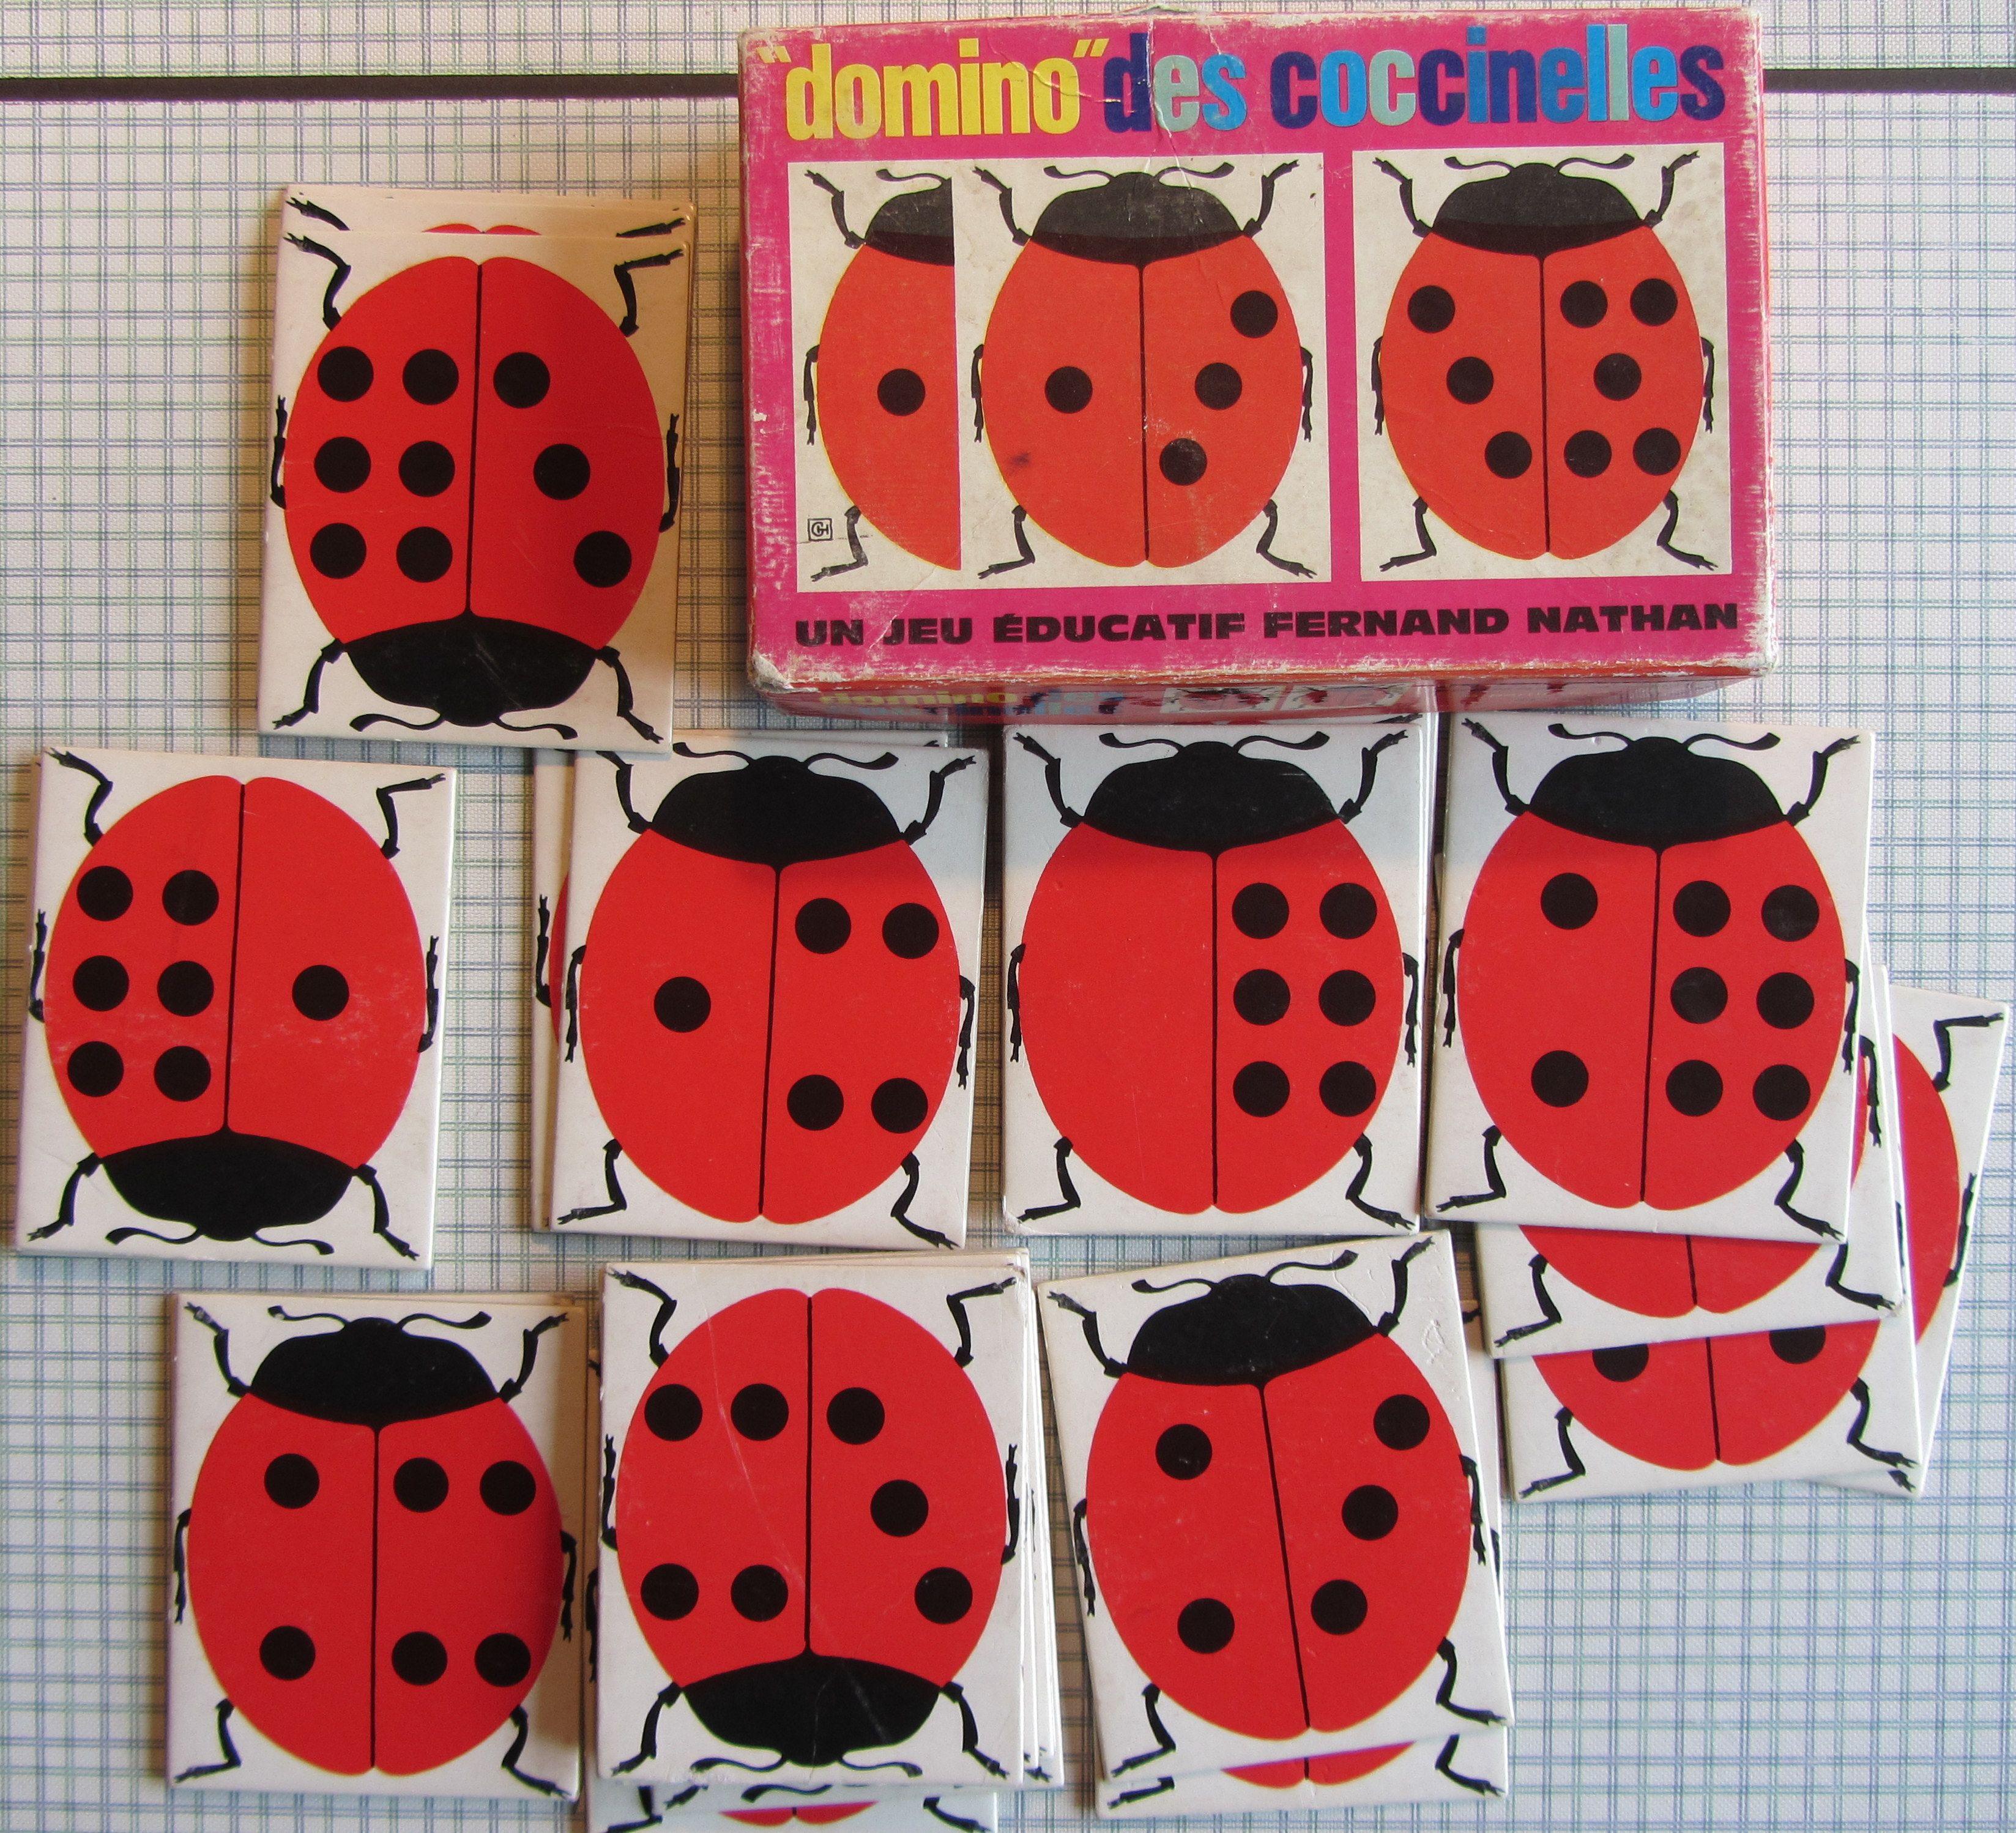 domino des coccinelles fernand nathan jeux eacute ducatifs vintage domino des coccinelles fernand nathan